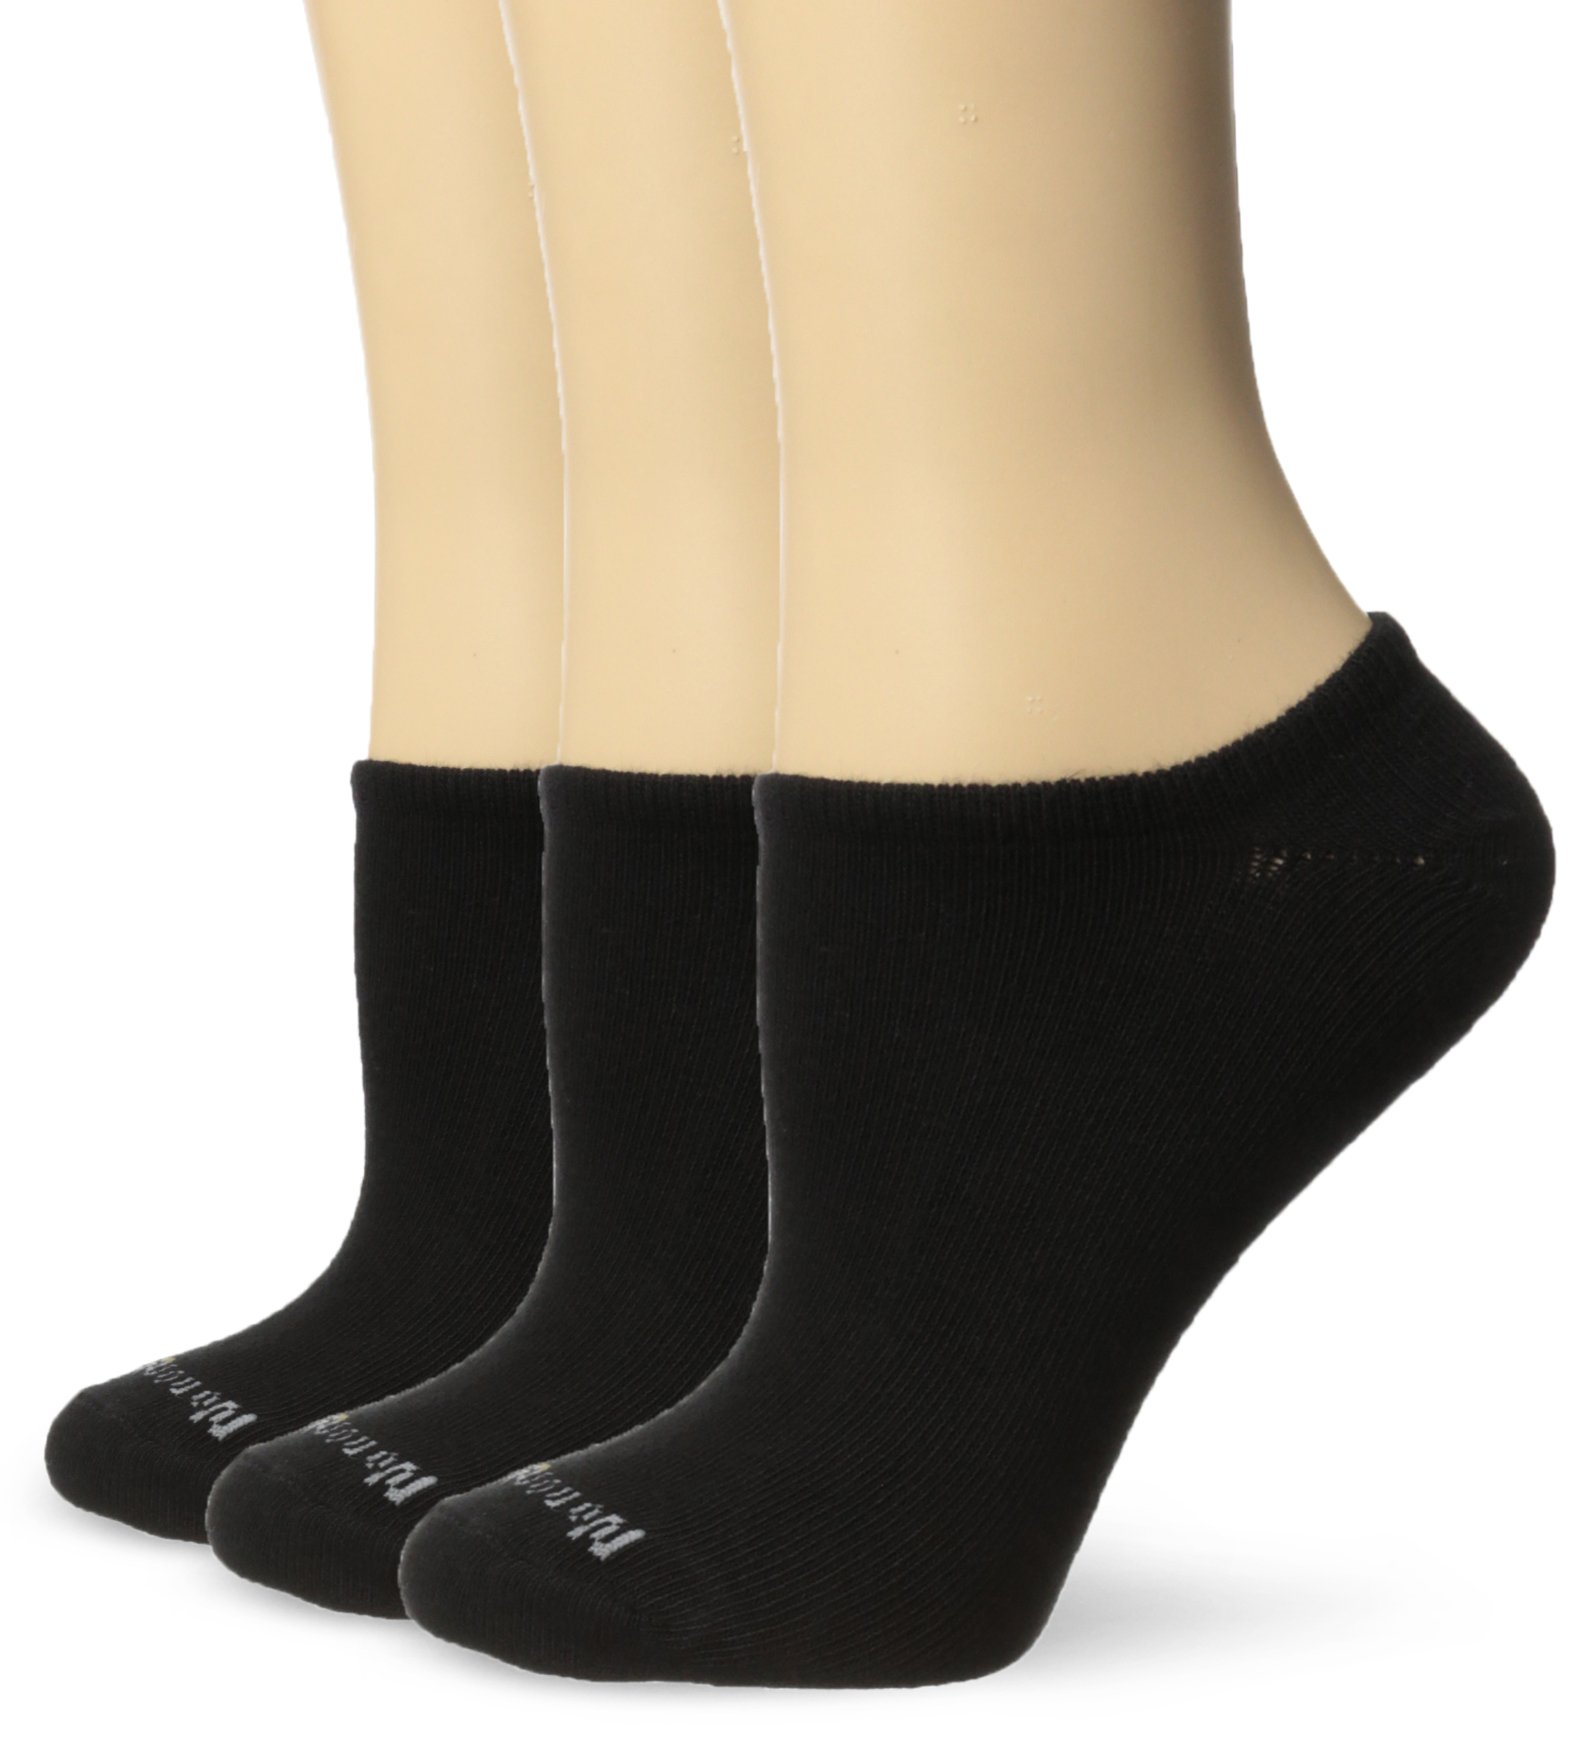 No nonsense Women s Ahh Said The Foot No Show Liner Socks - 3 Pair Pack  product 608b82315